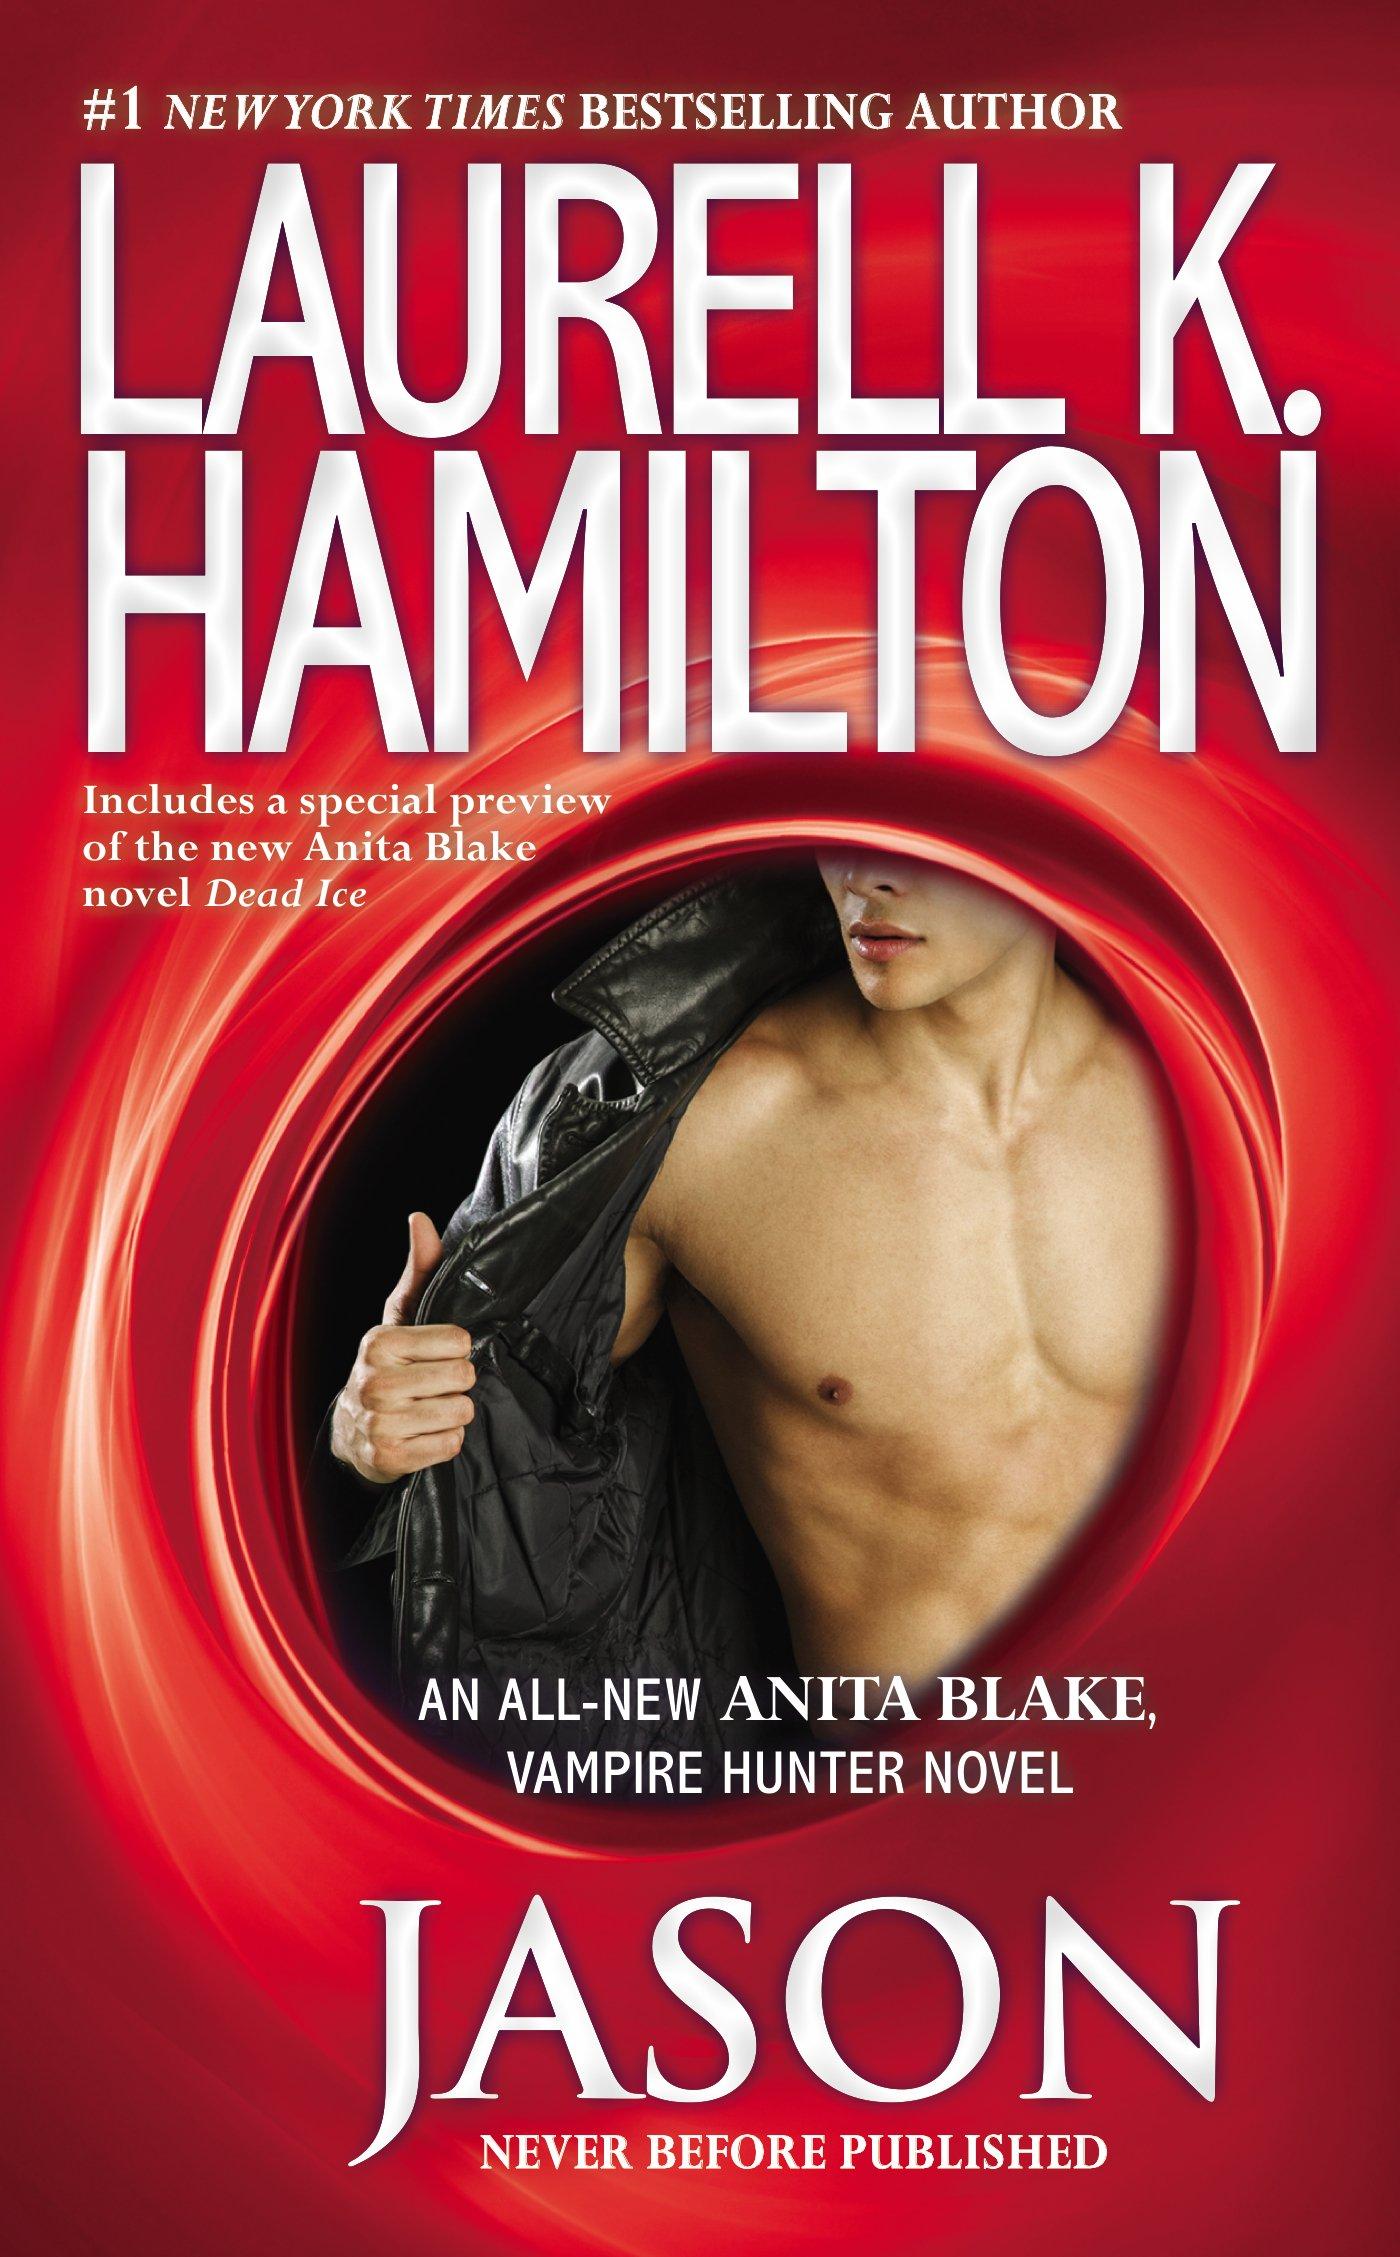 Jason (Anita Blake, Vampire Hunter) - Laurell K. Hamilton